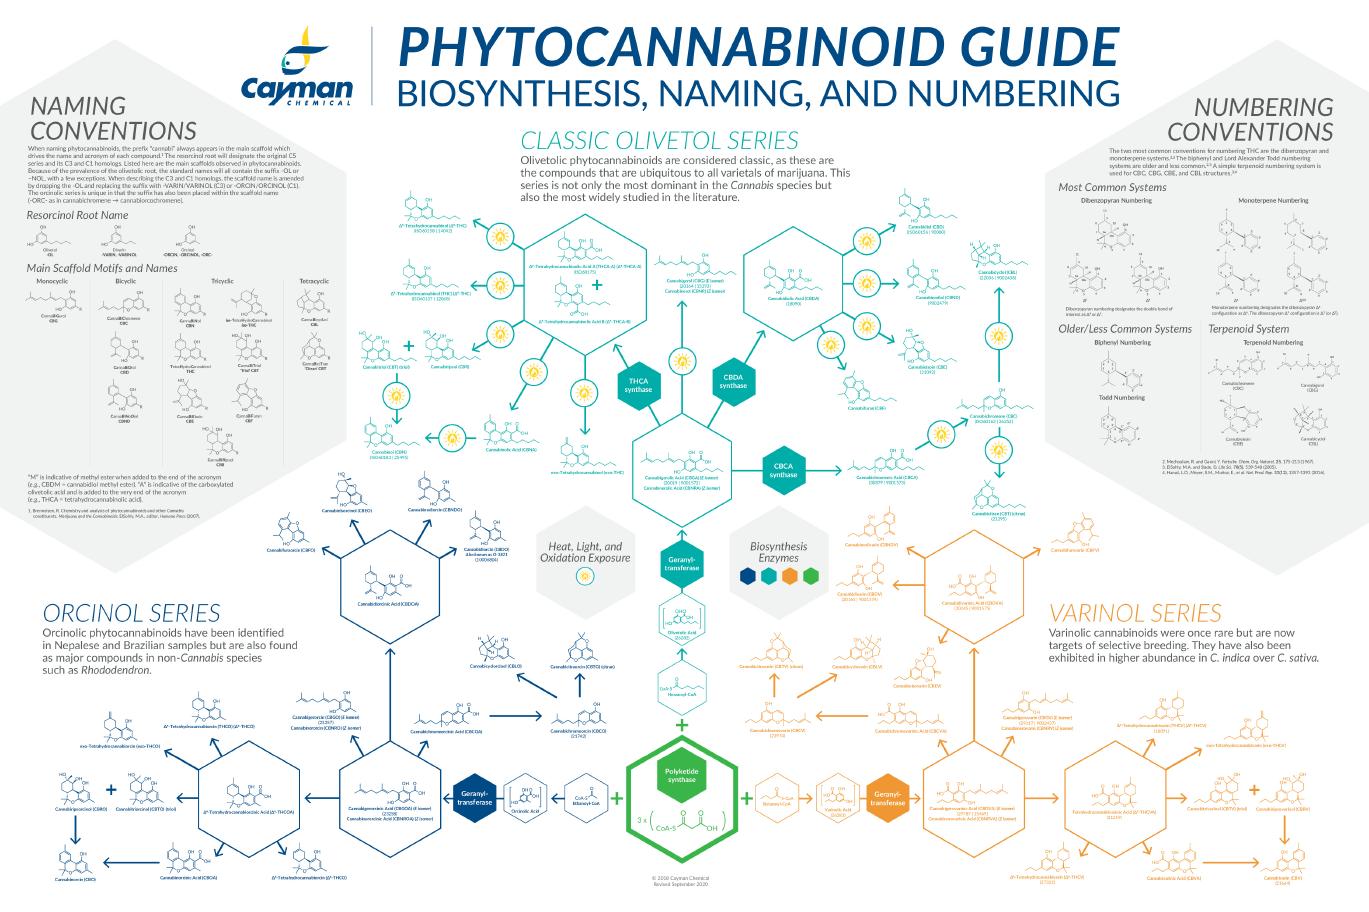 Phytocannabinoid Guide